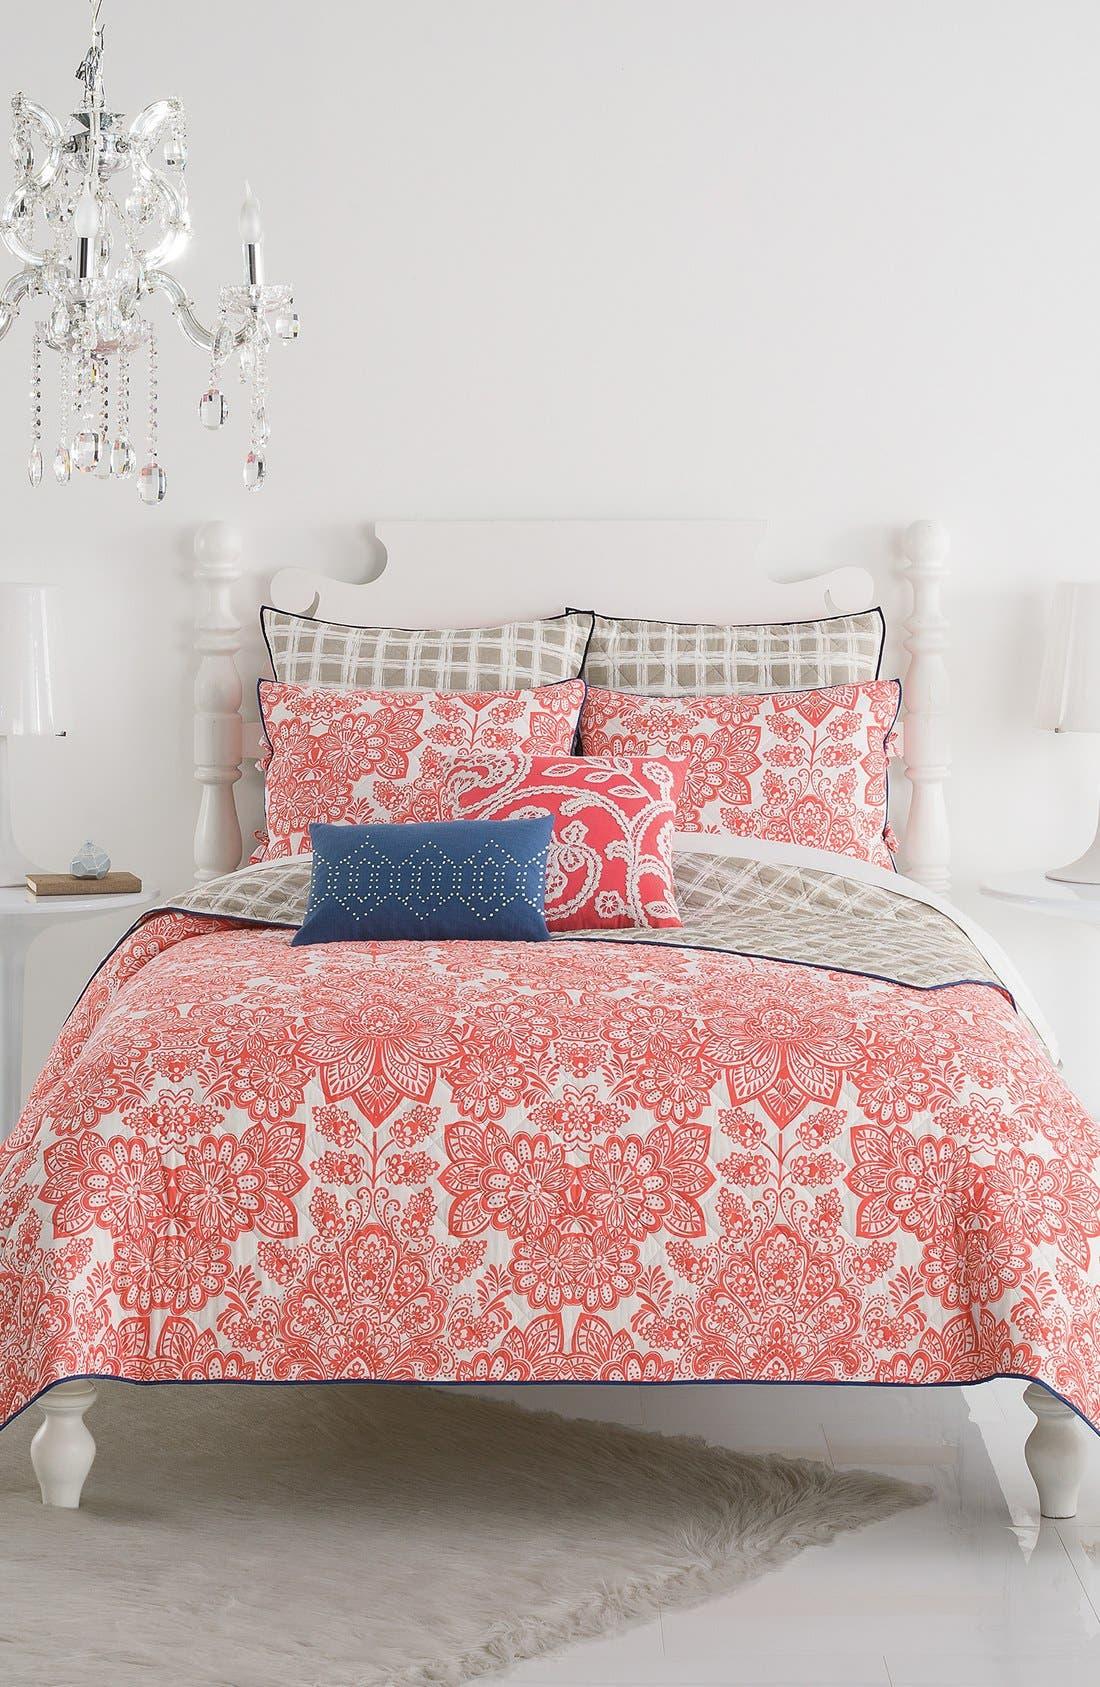 KAS Designs 'Ingrid' Quilt